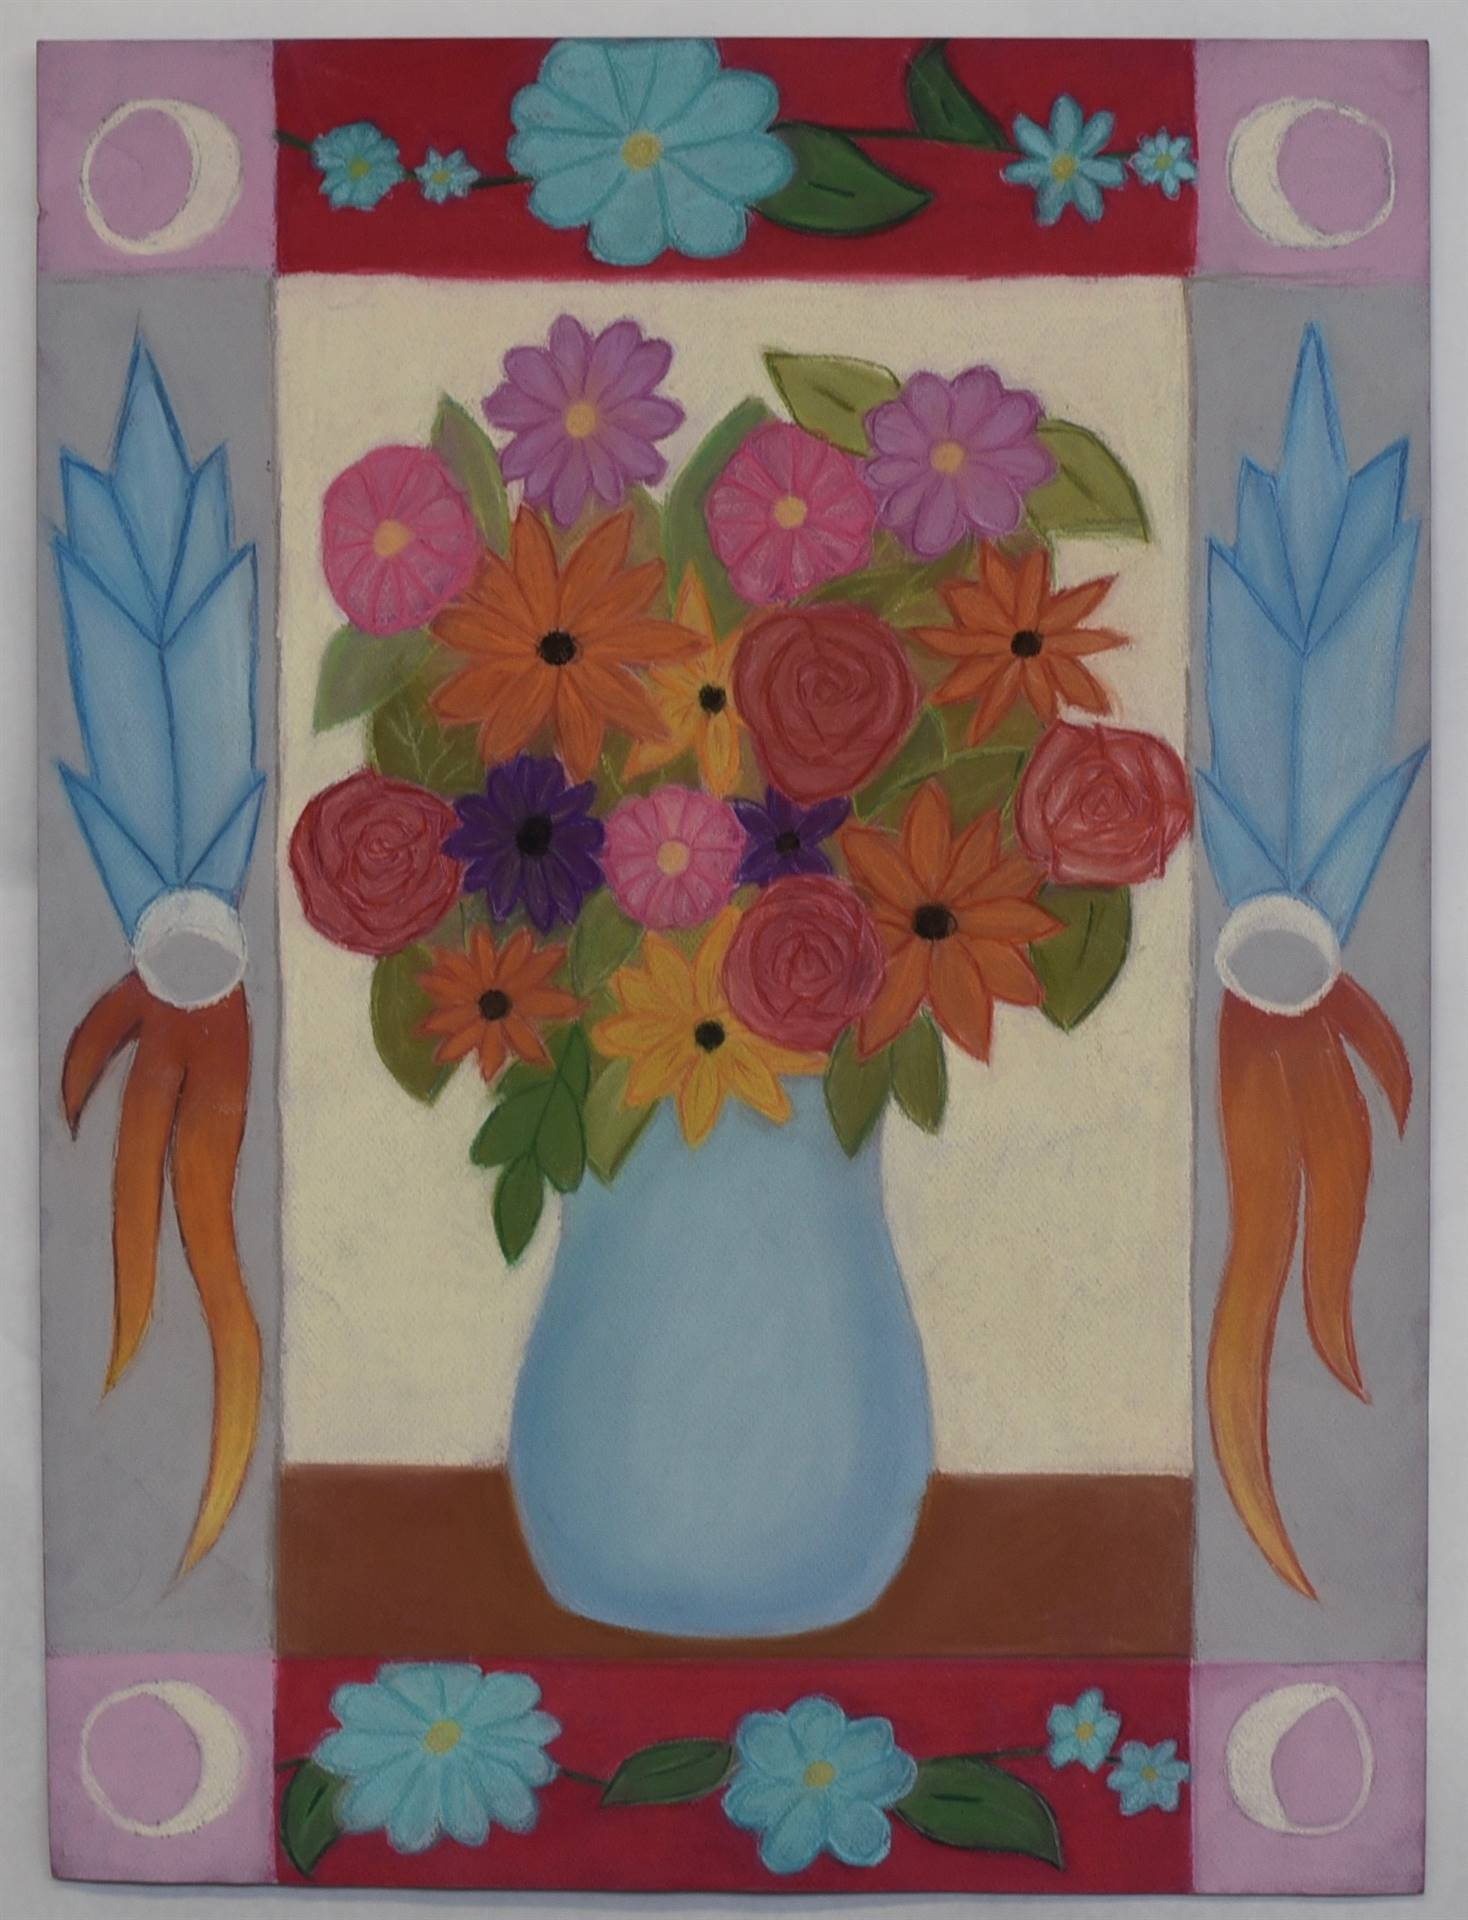 Brecksville-Broadview Hts. Middle School Art Projects 28